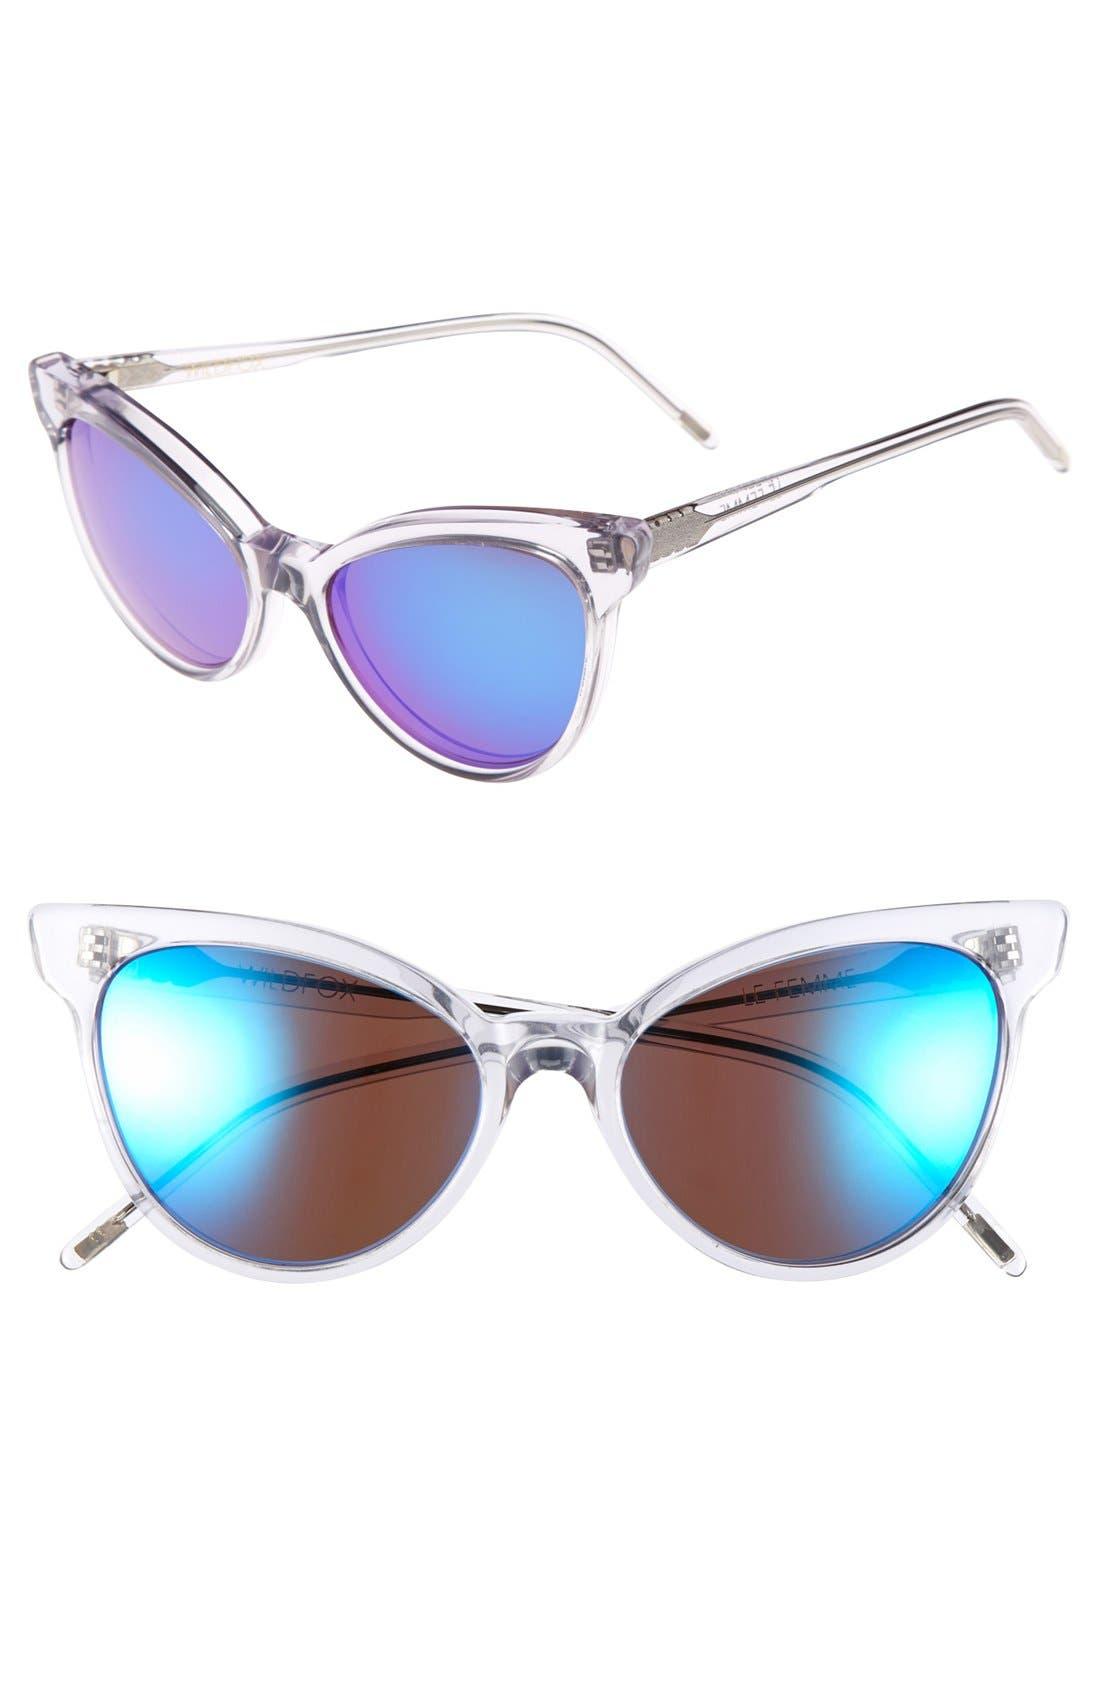 Main Image - Wildfox 'La Femme Deluxe' 55mm Sunglasses